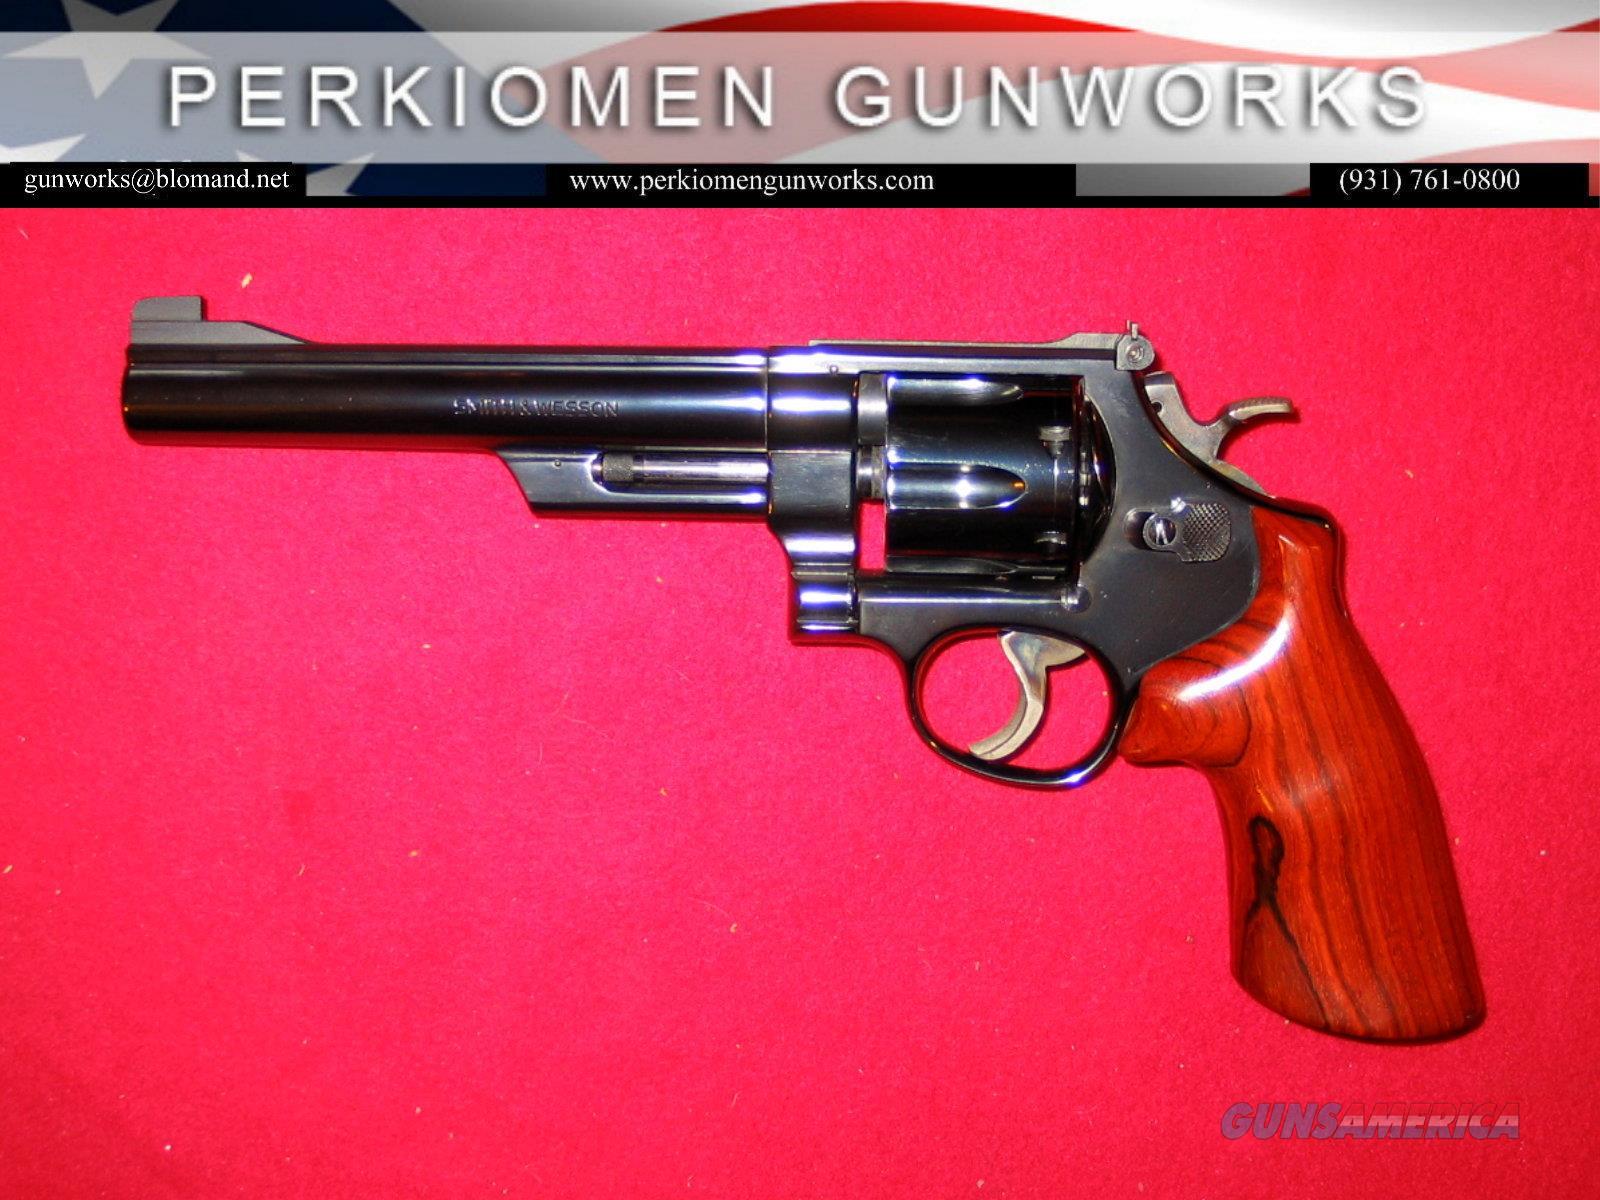 "25-2, .45ACP, ""The 1955 Model .45 Target Heavy Barrel"", 6.5 "", blued  Guns > Pistols > Smith & Wesson Revolvers > Full Frame Revolver"